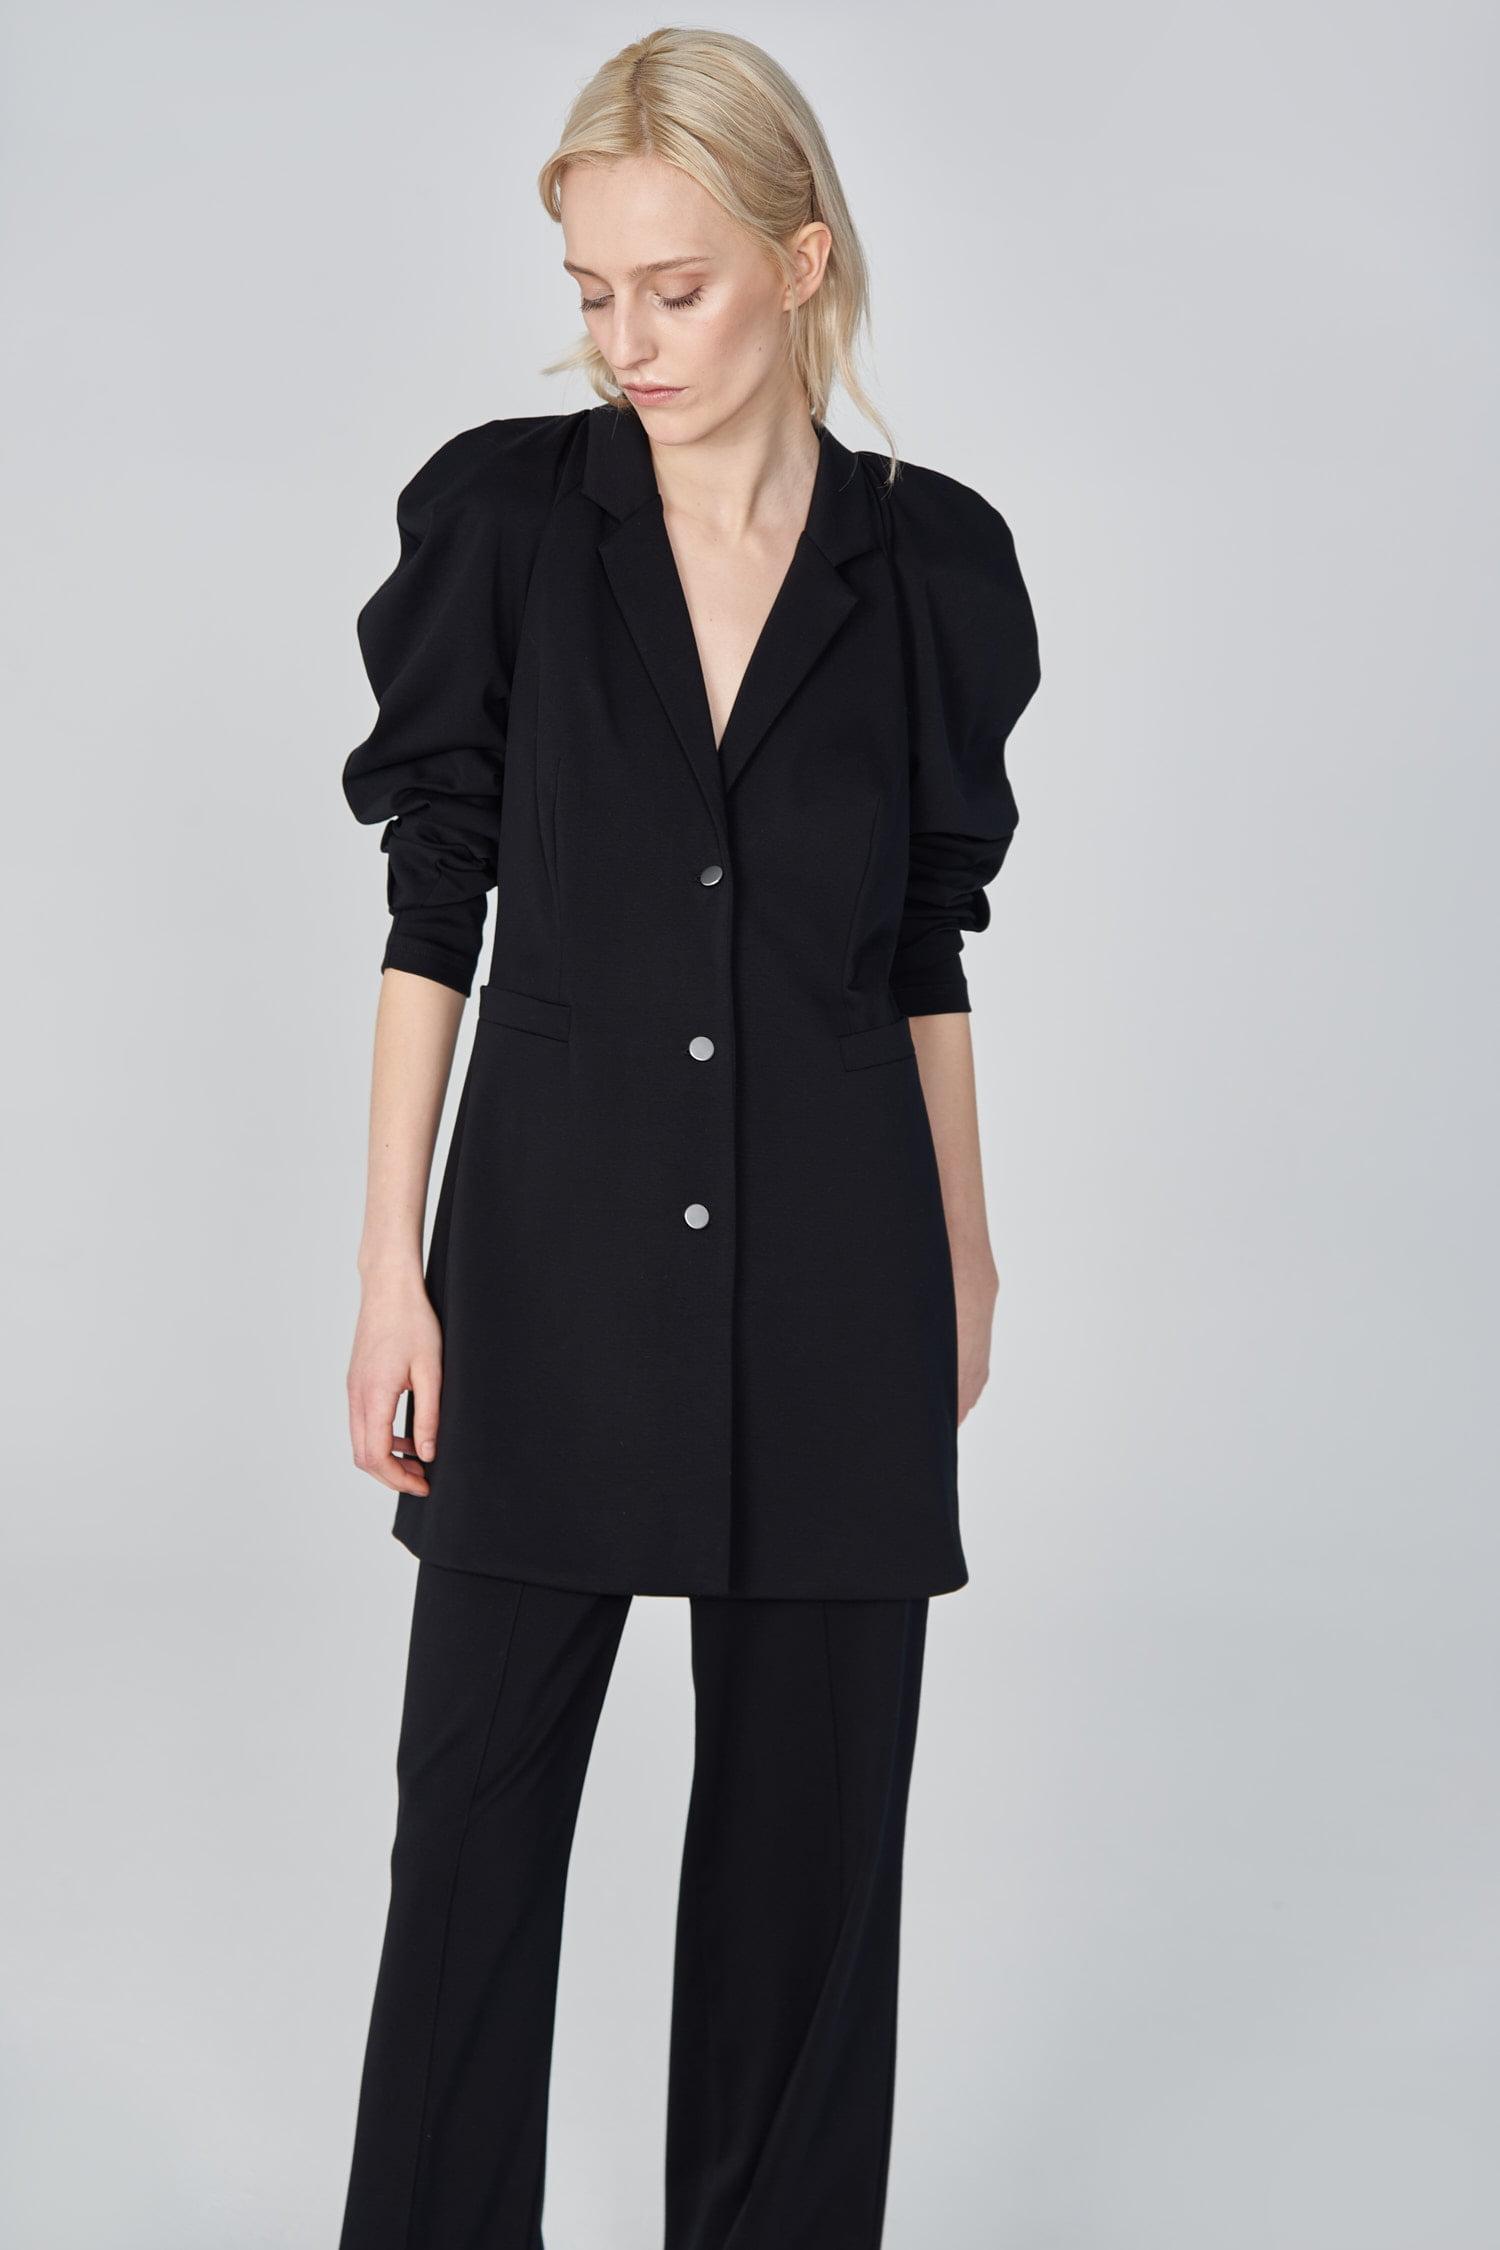 Acephala Ss21 Black Long Tailored Jacket Front Detail